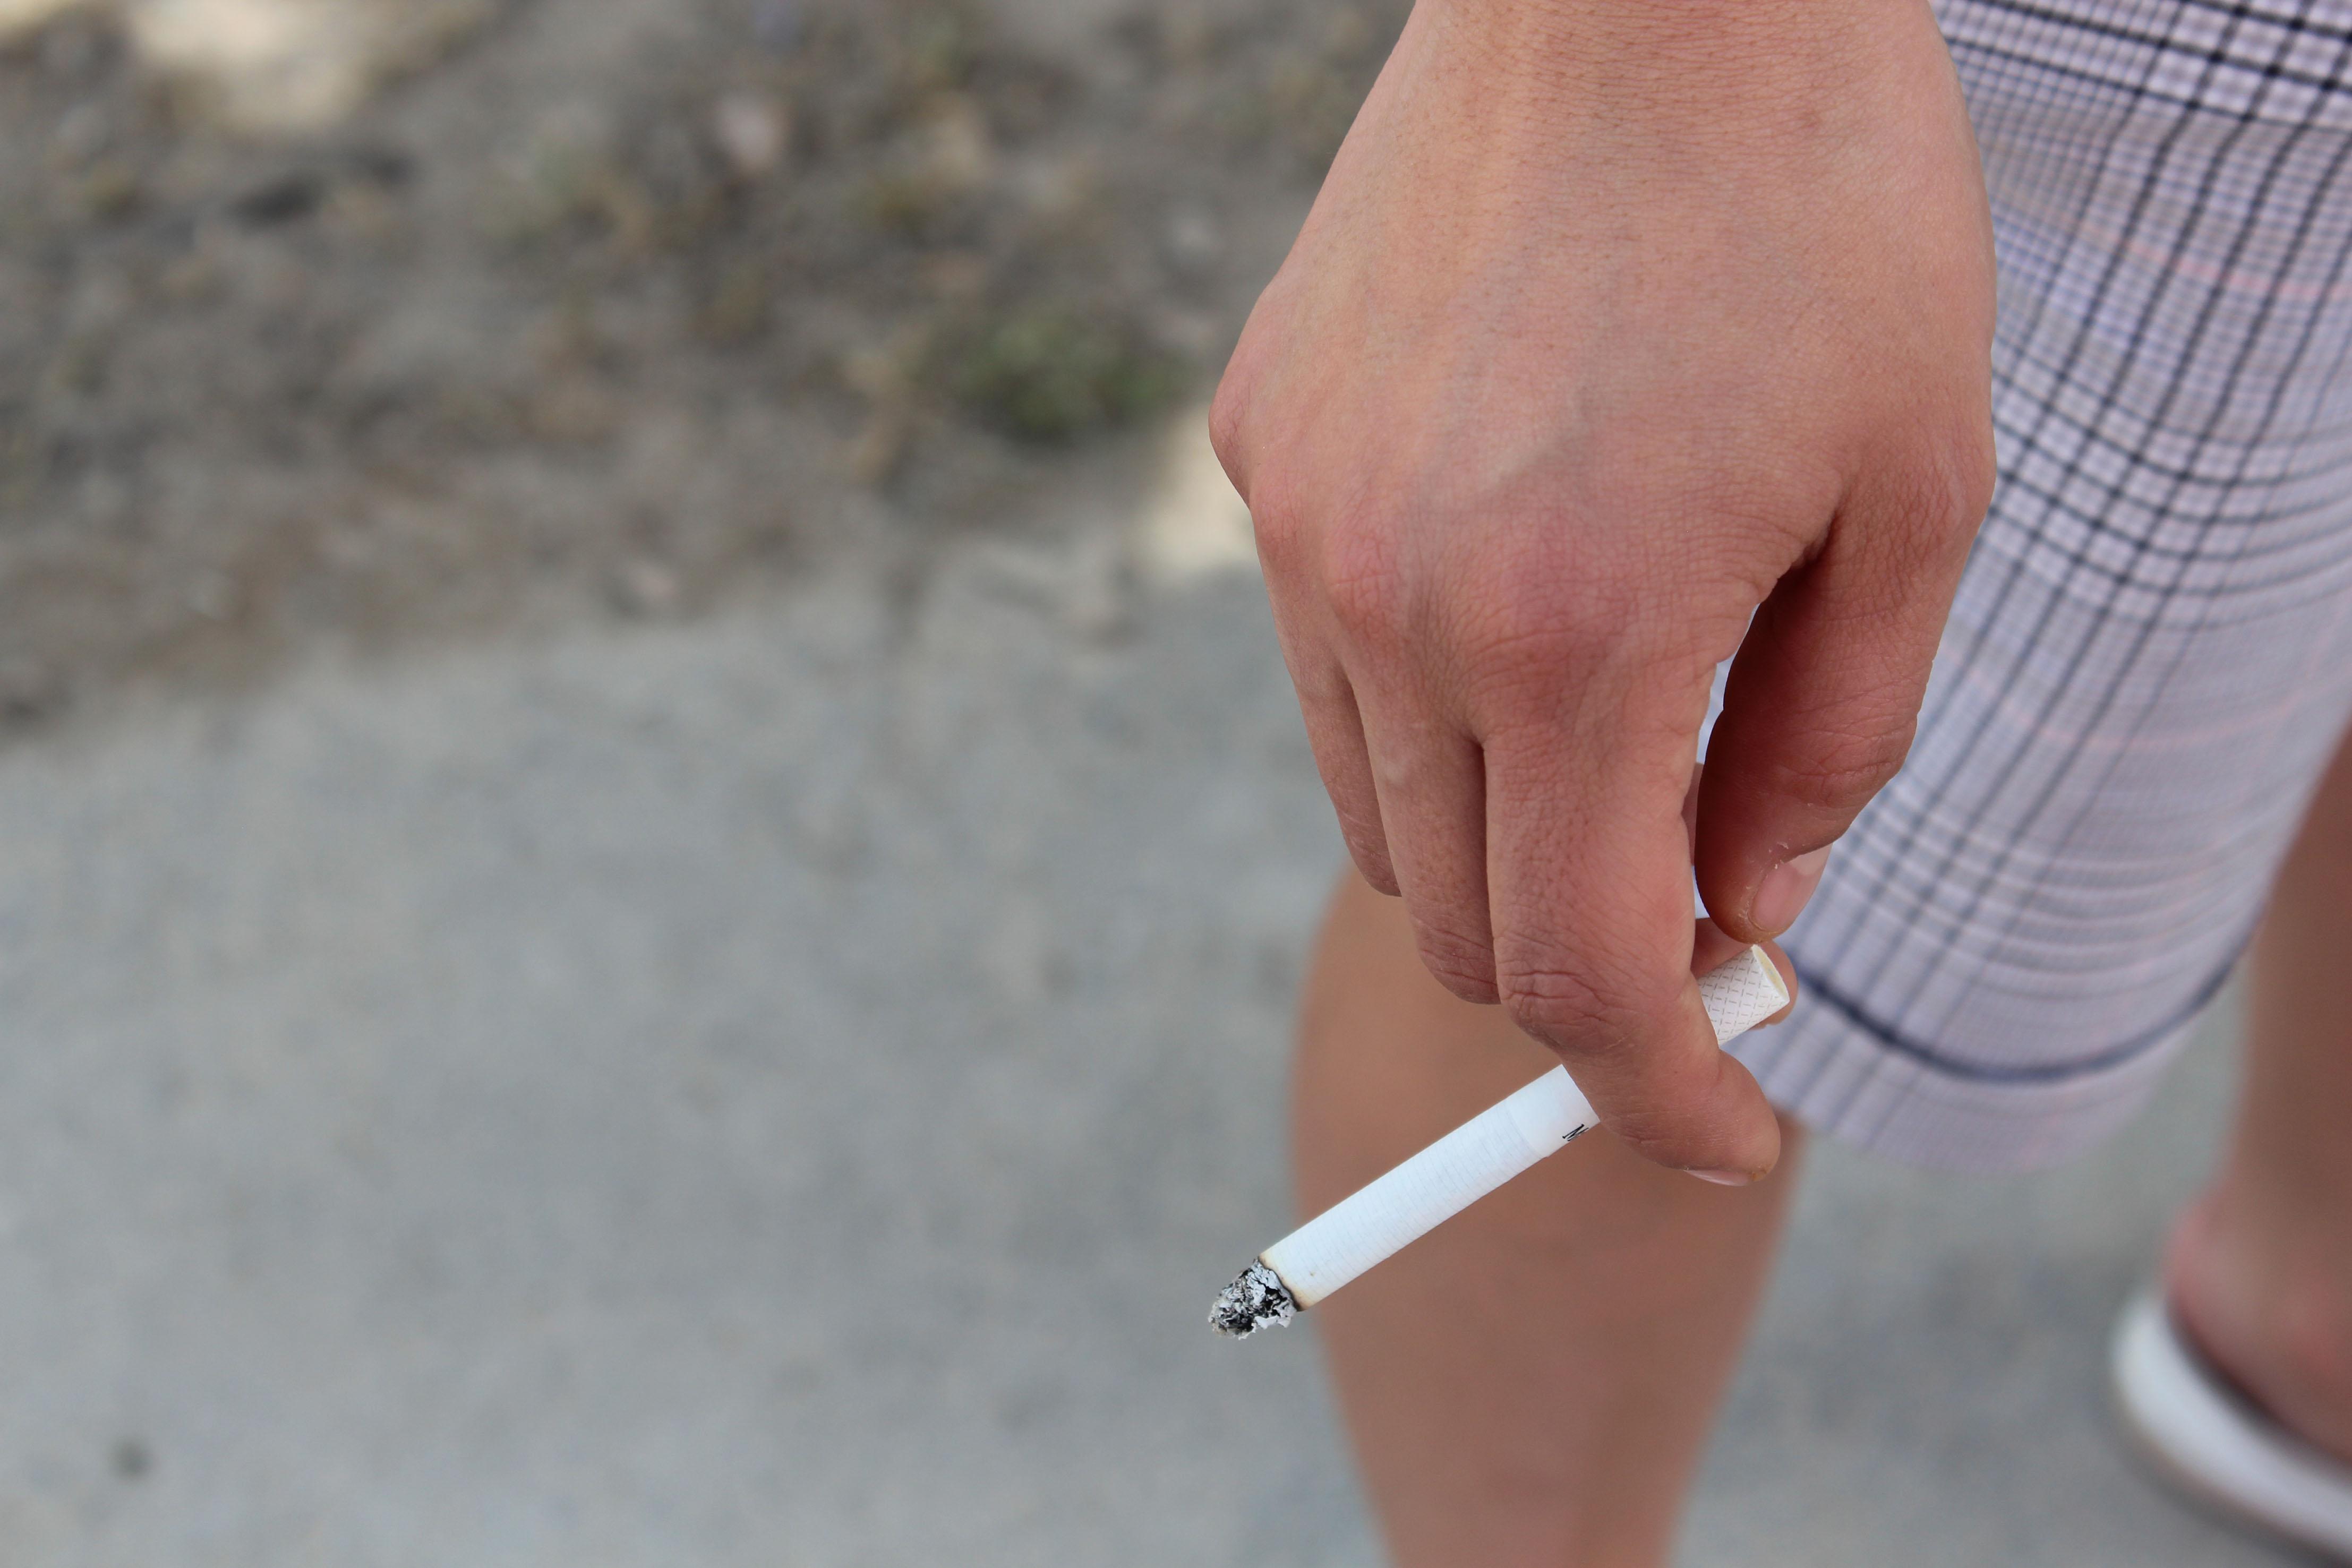 Consuming tobacco.